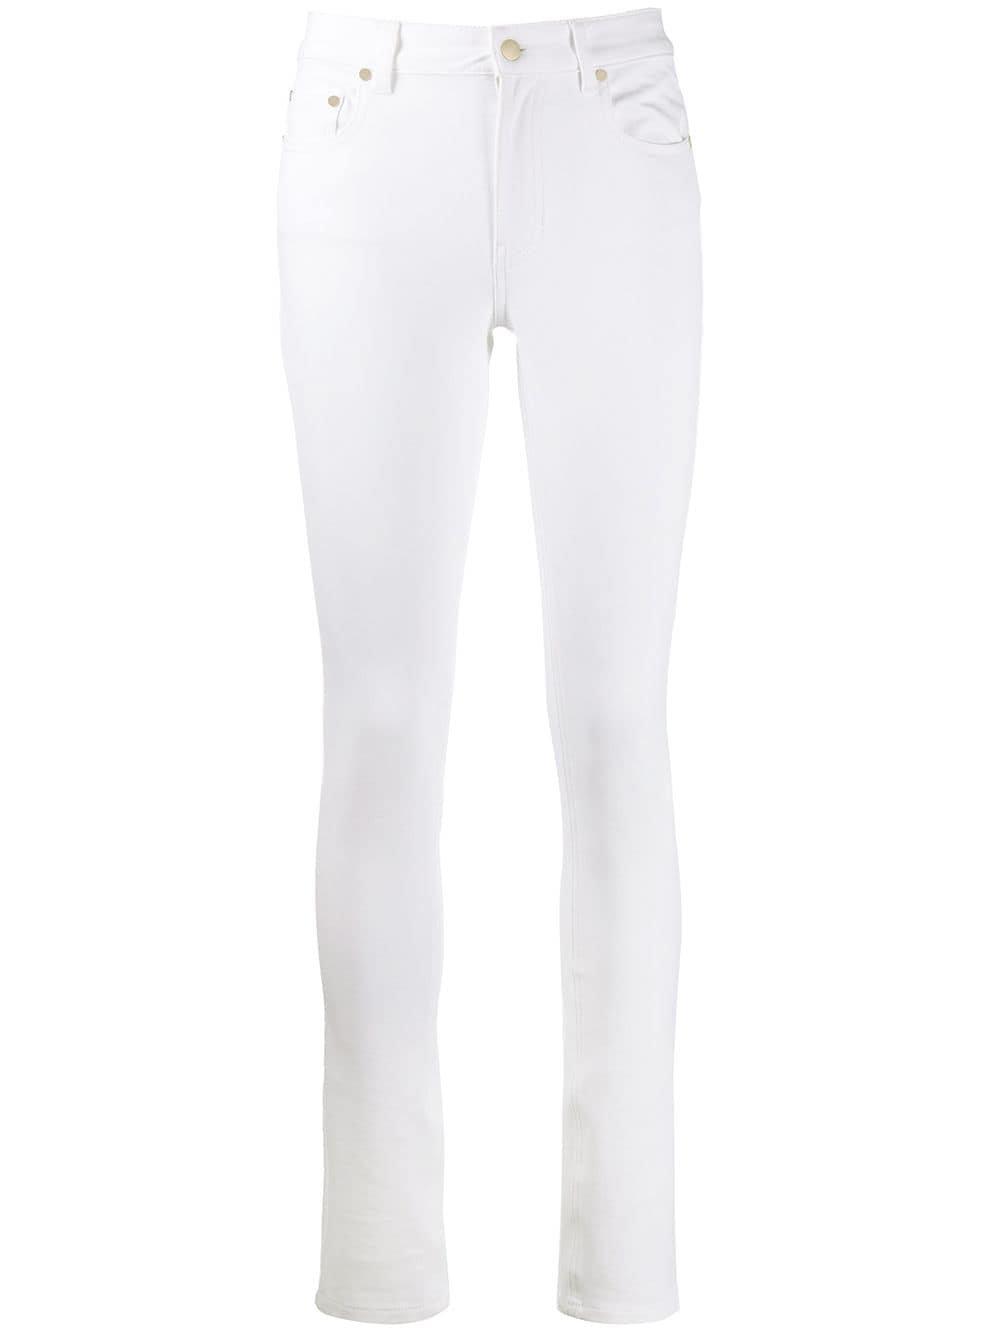 Joseph Mid Rise Skinny Trousers